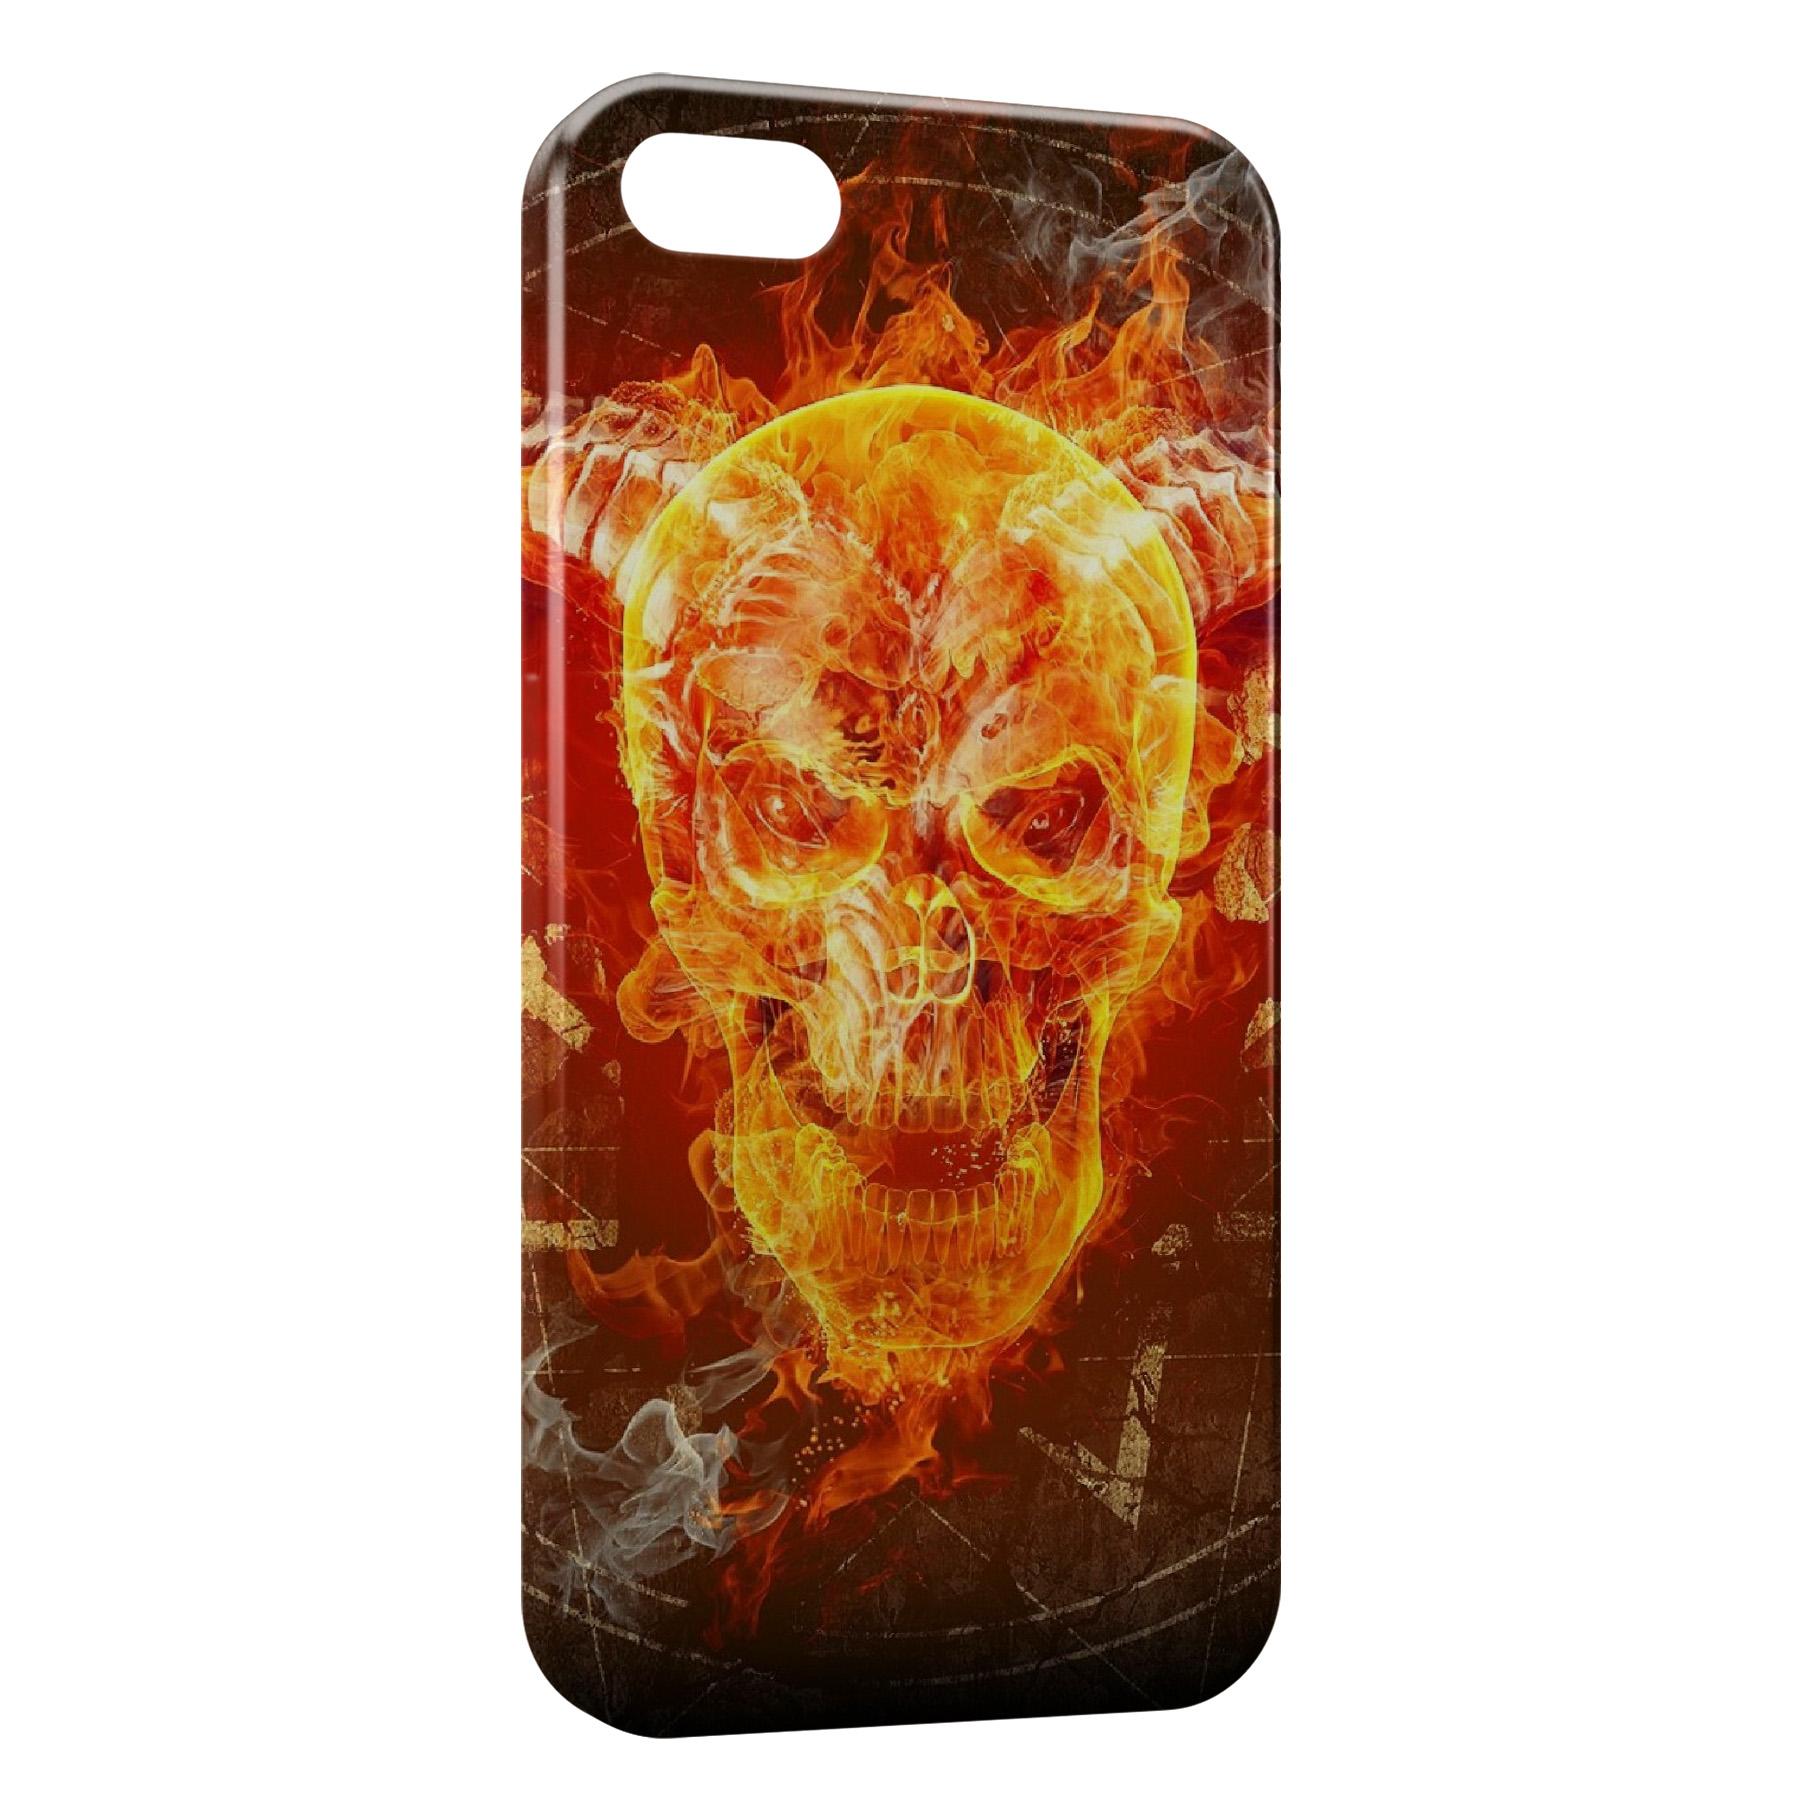 Coque Iphone 7 7 Plus Tete De Mort Fire Feu